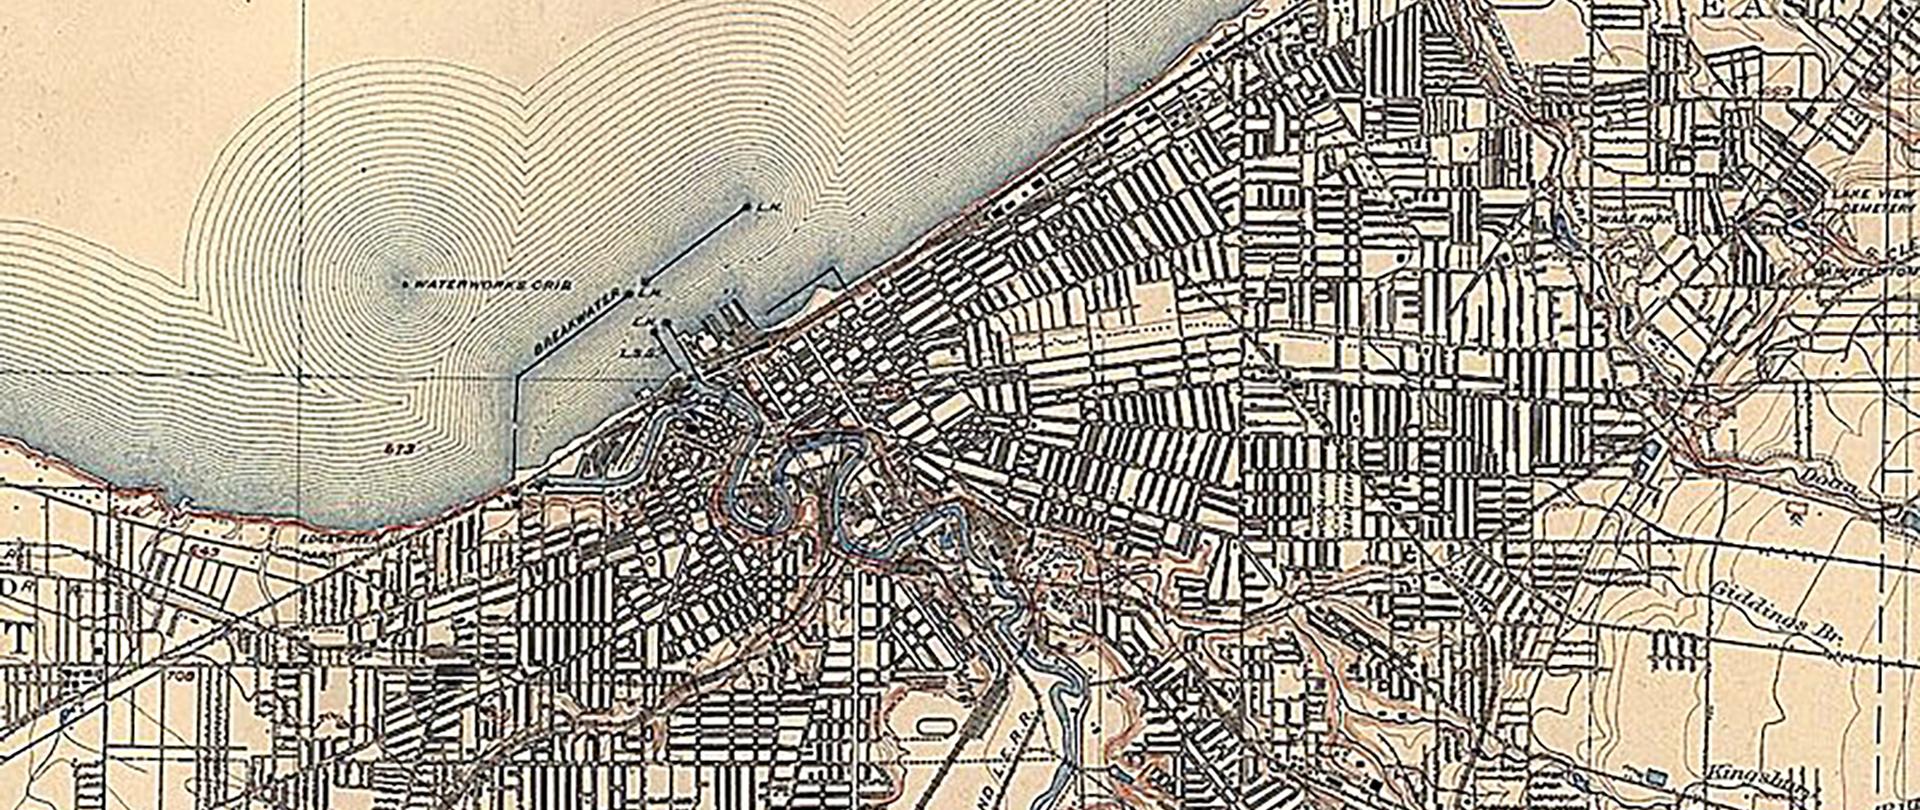 History_Cleveland Map.jpg